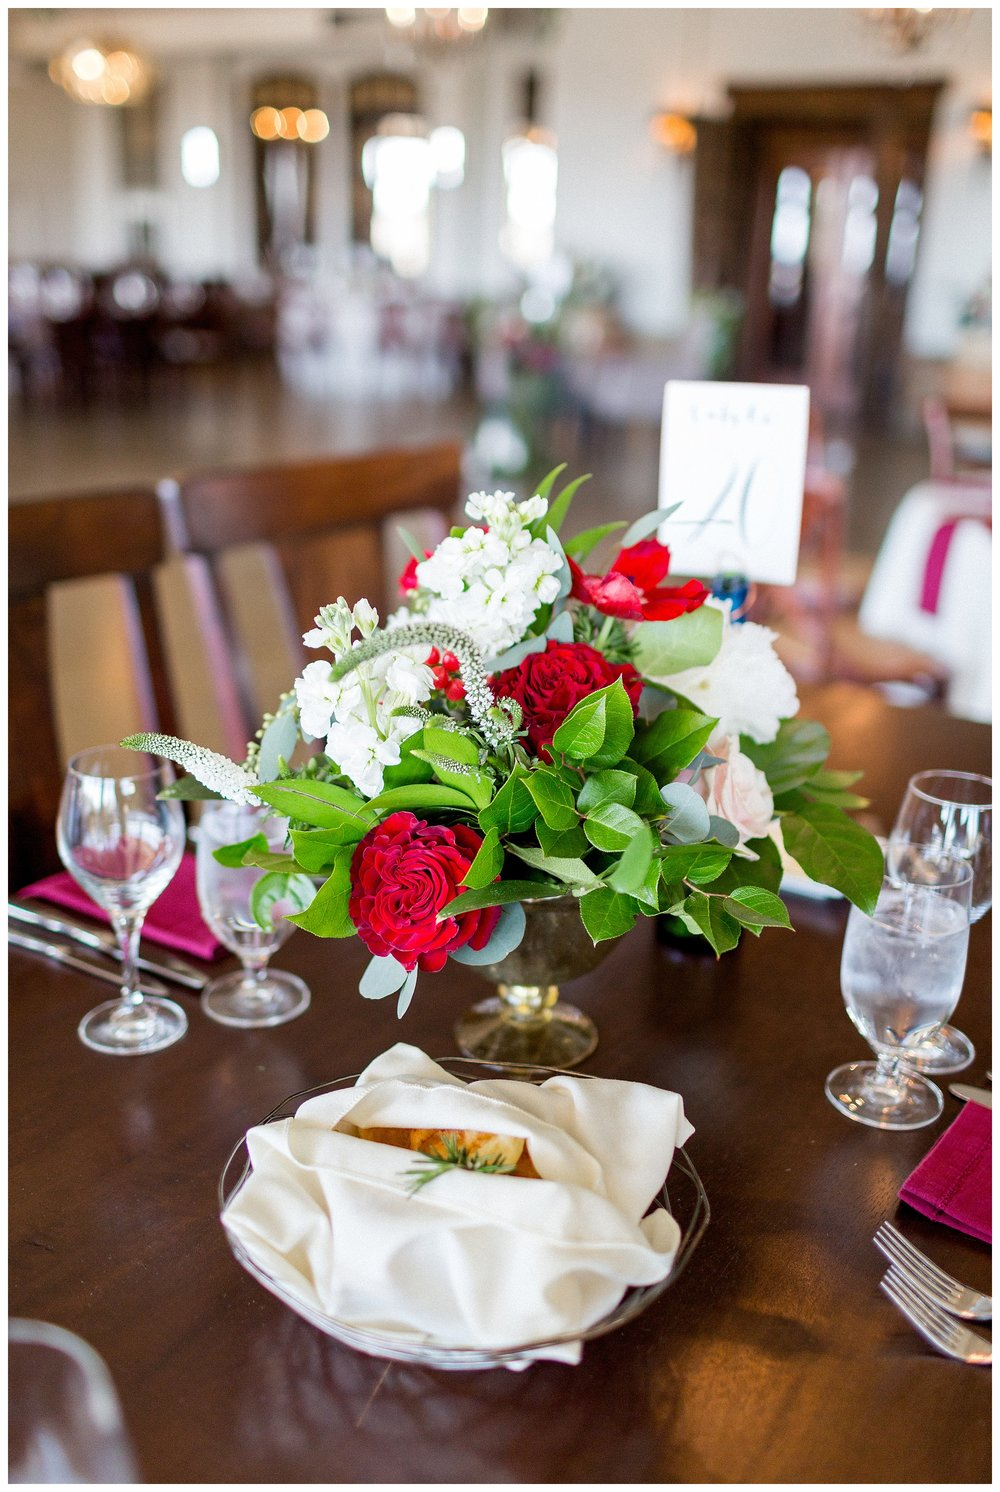 Stone Tower Winery Wedding | Virginia Winter Wedding | VA Wedding Photographer Kir Tuben_0082.jpg